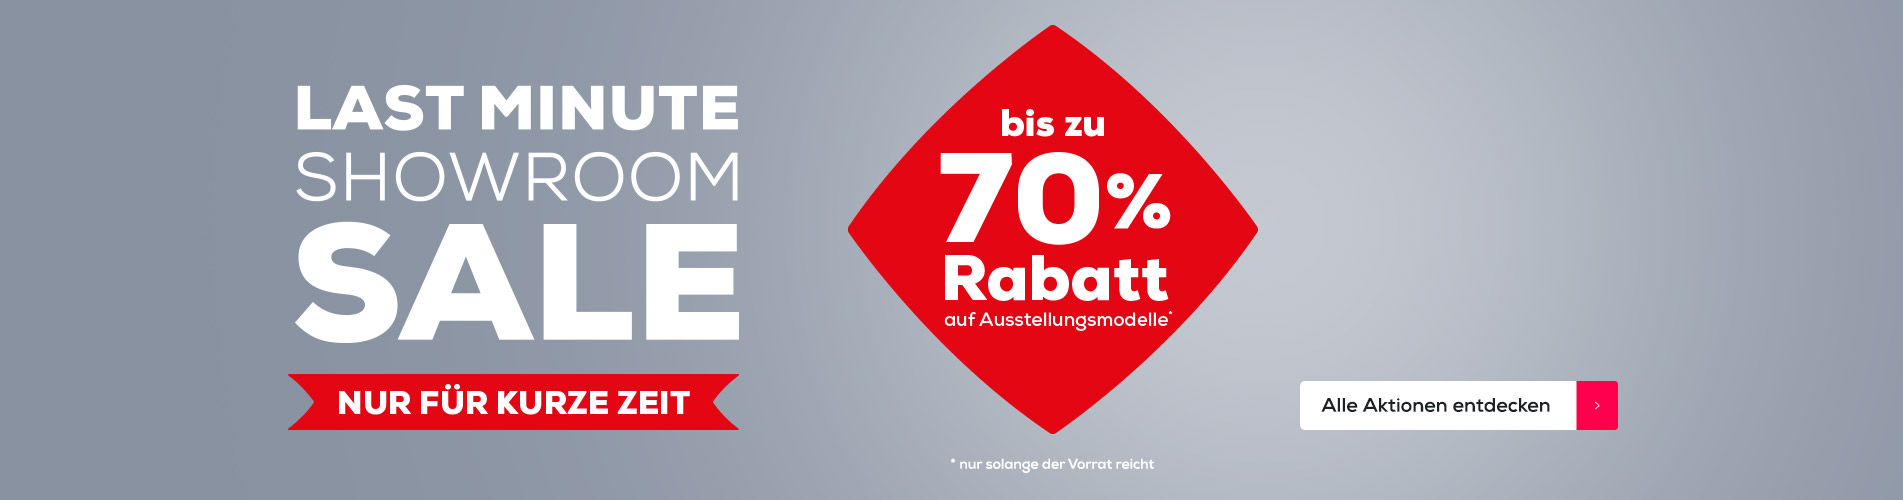 Last minute showroom sale | Swiss Sense